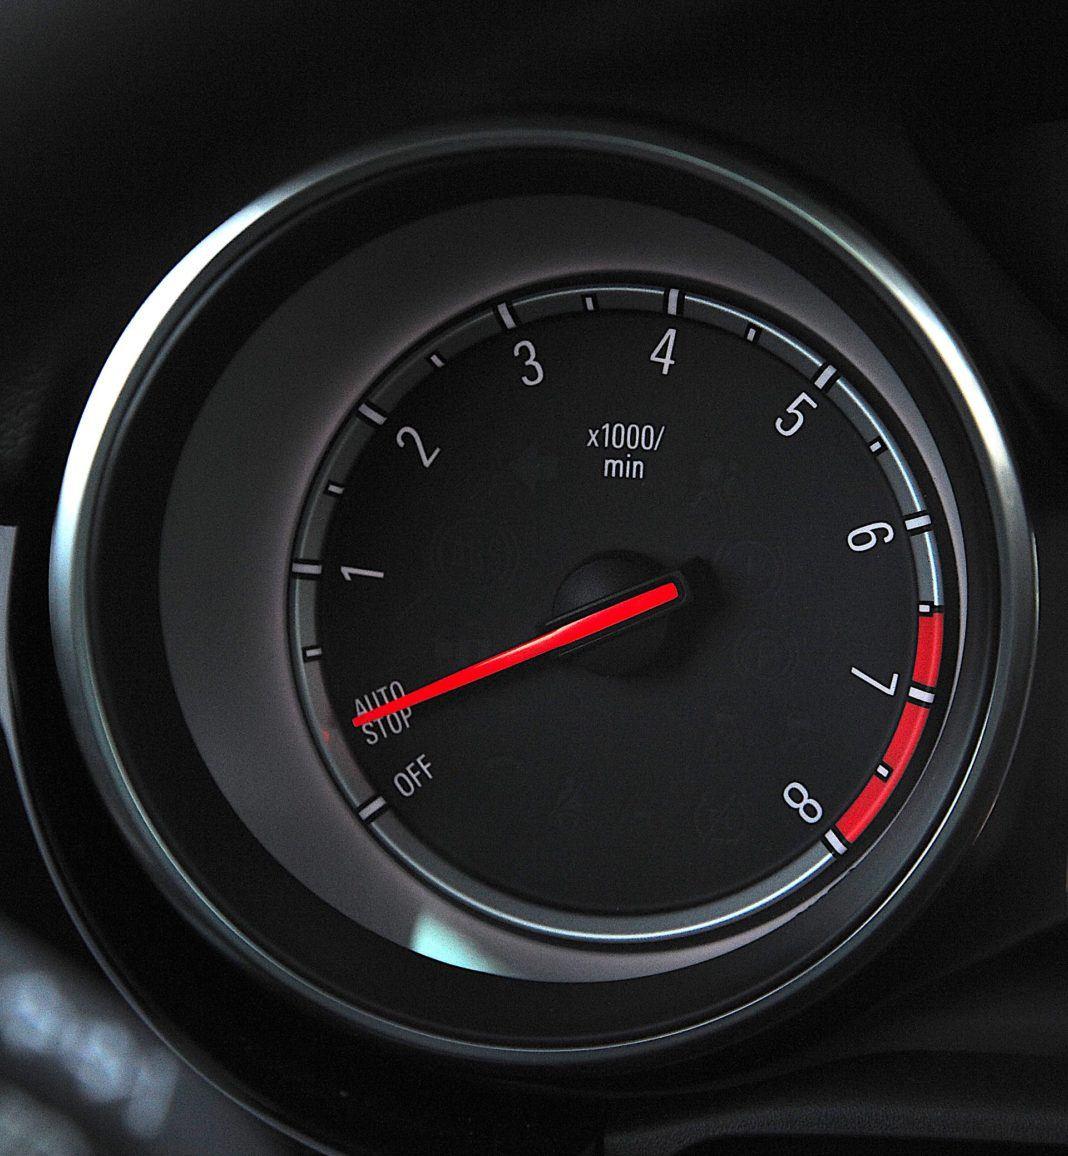 Opel Astra - system start/stop